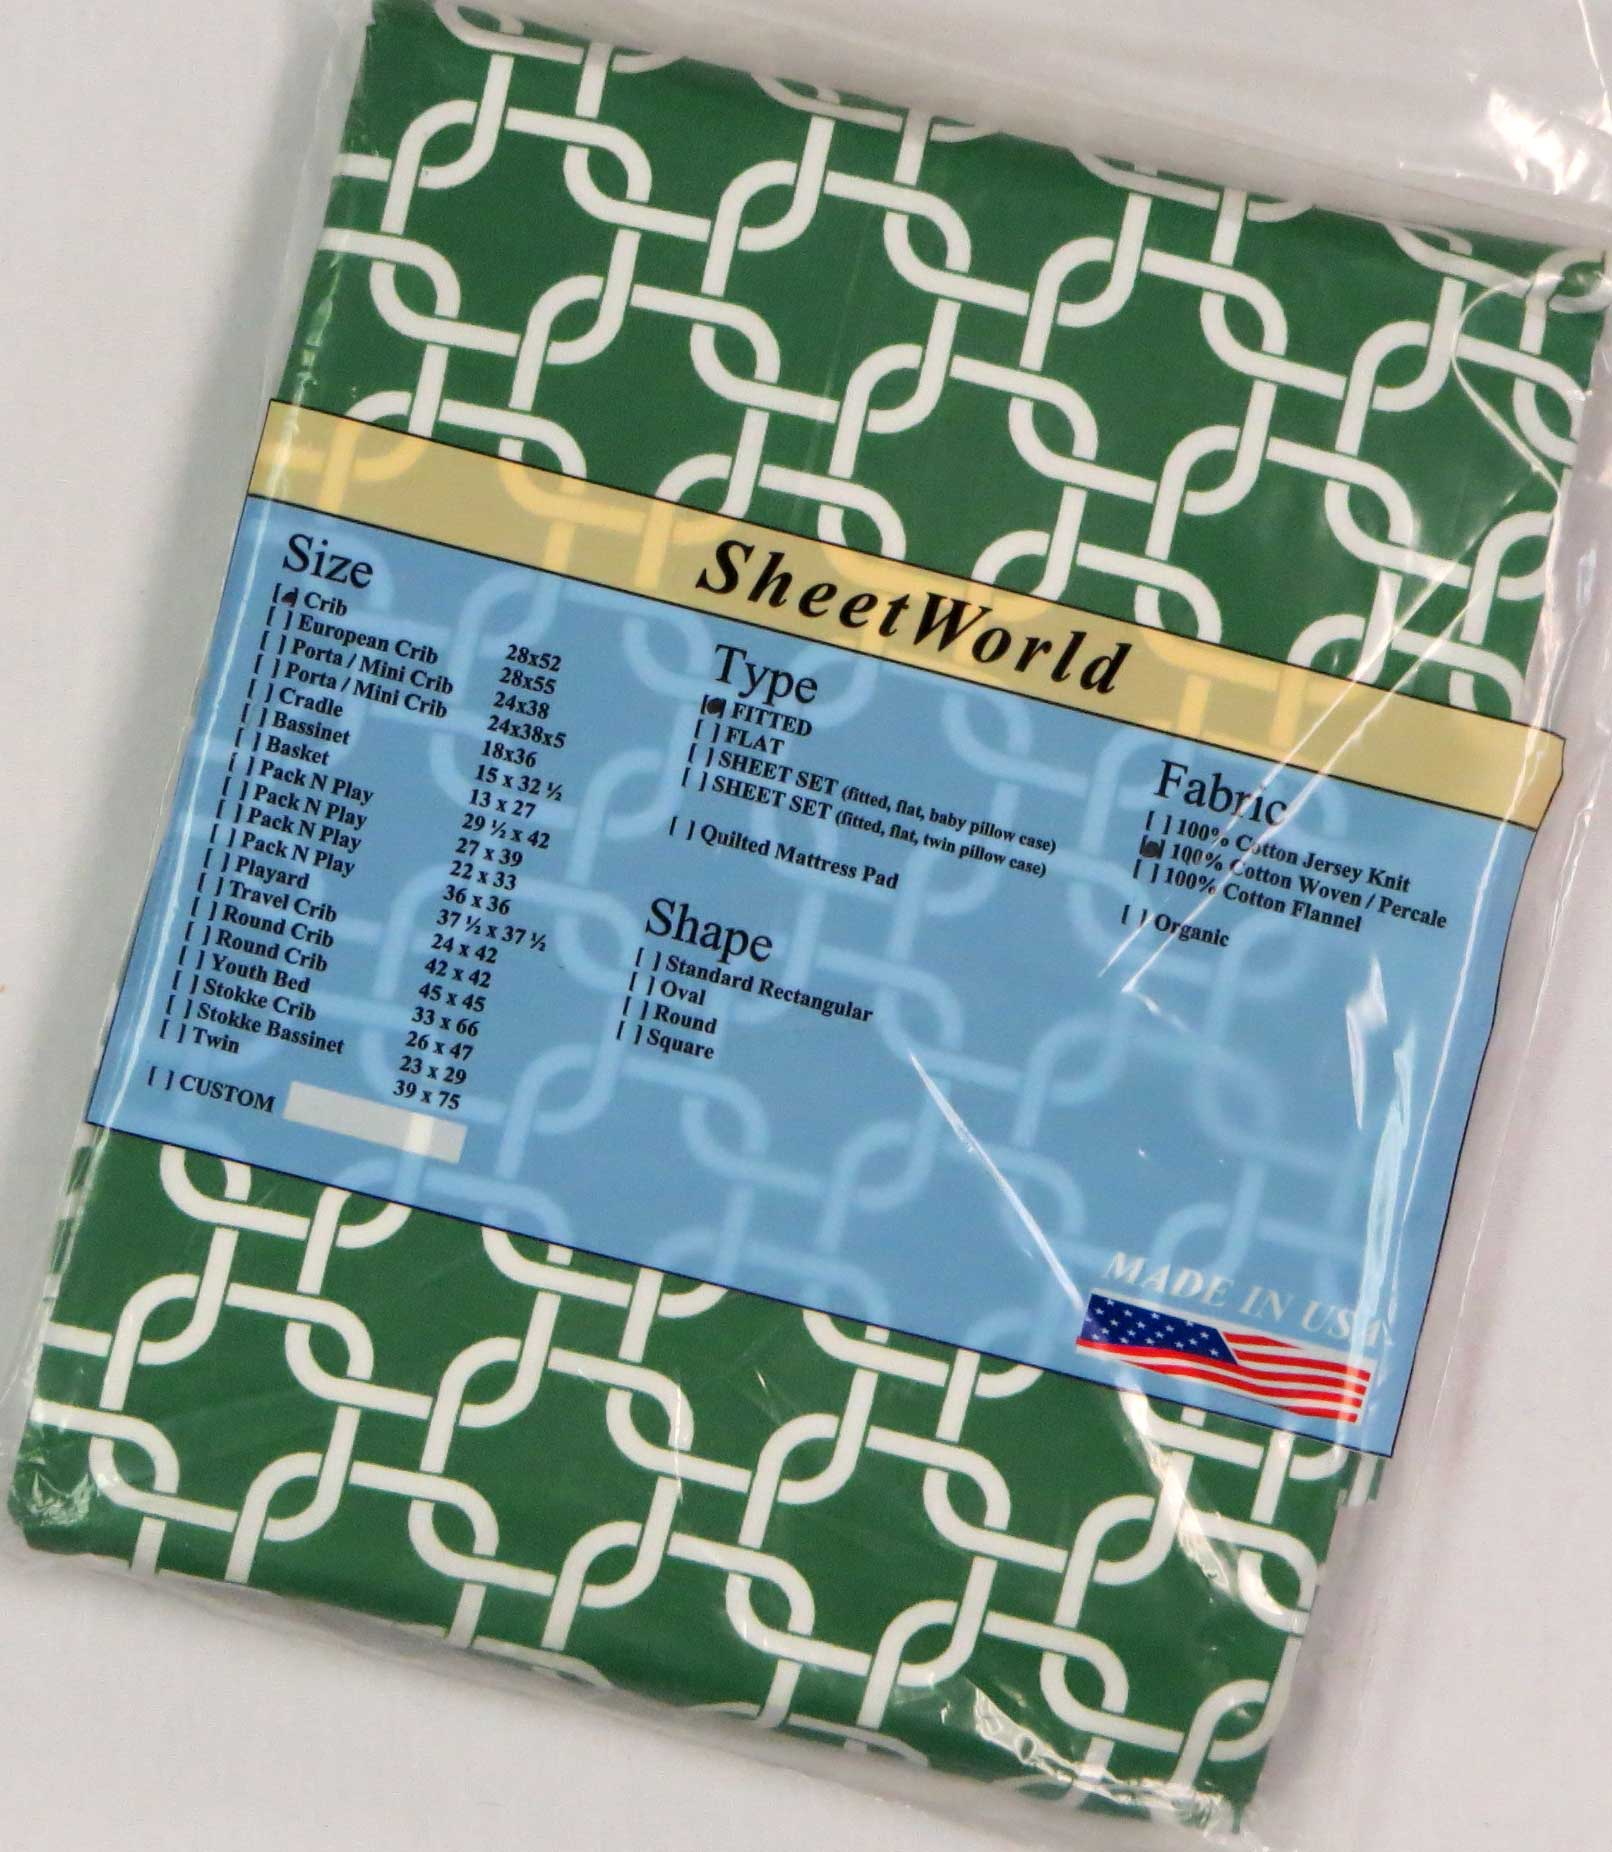 Green Links Cotton Crib Sheet - 28 x 52